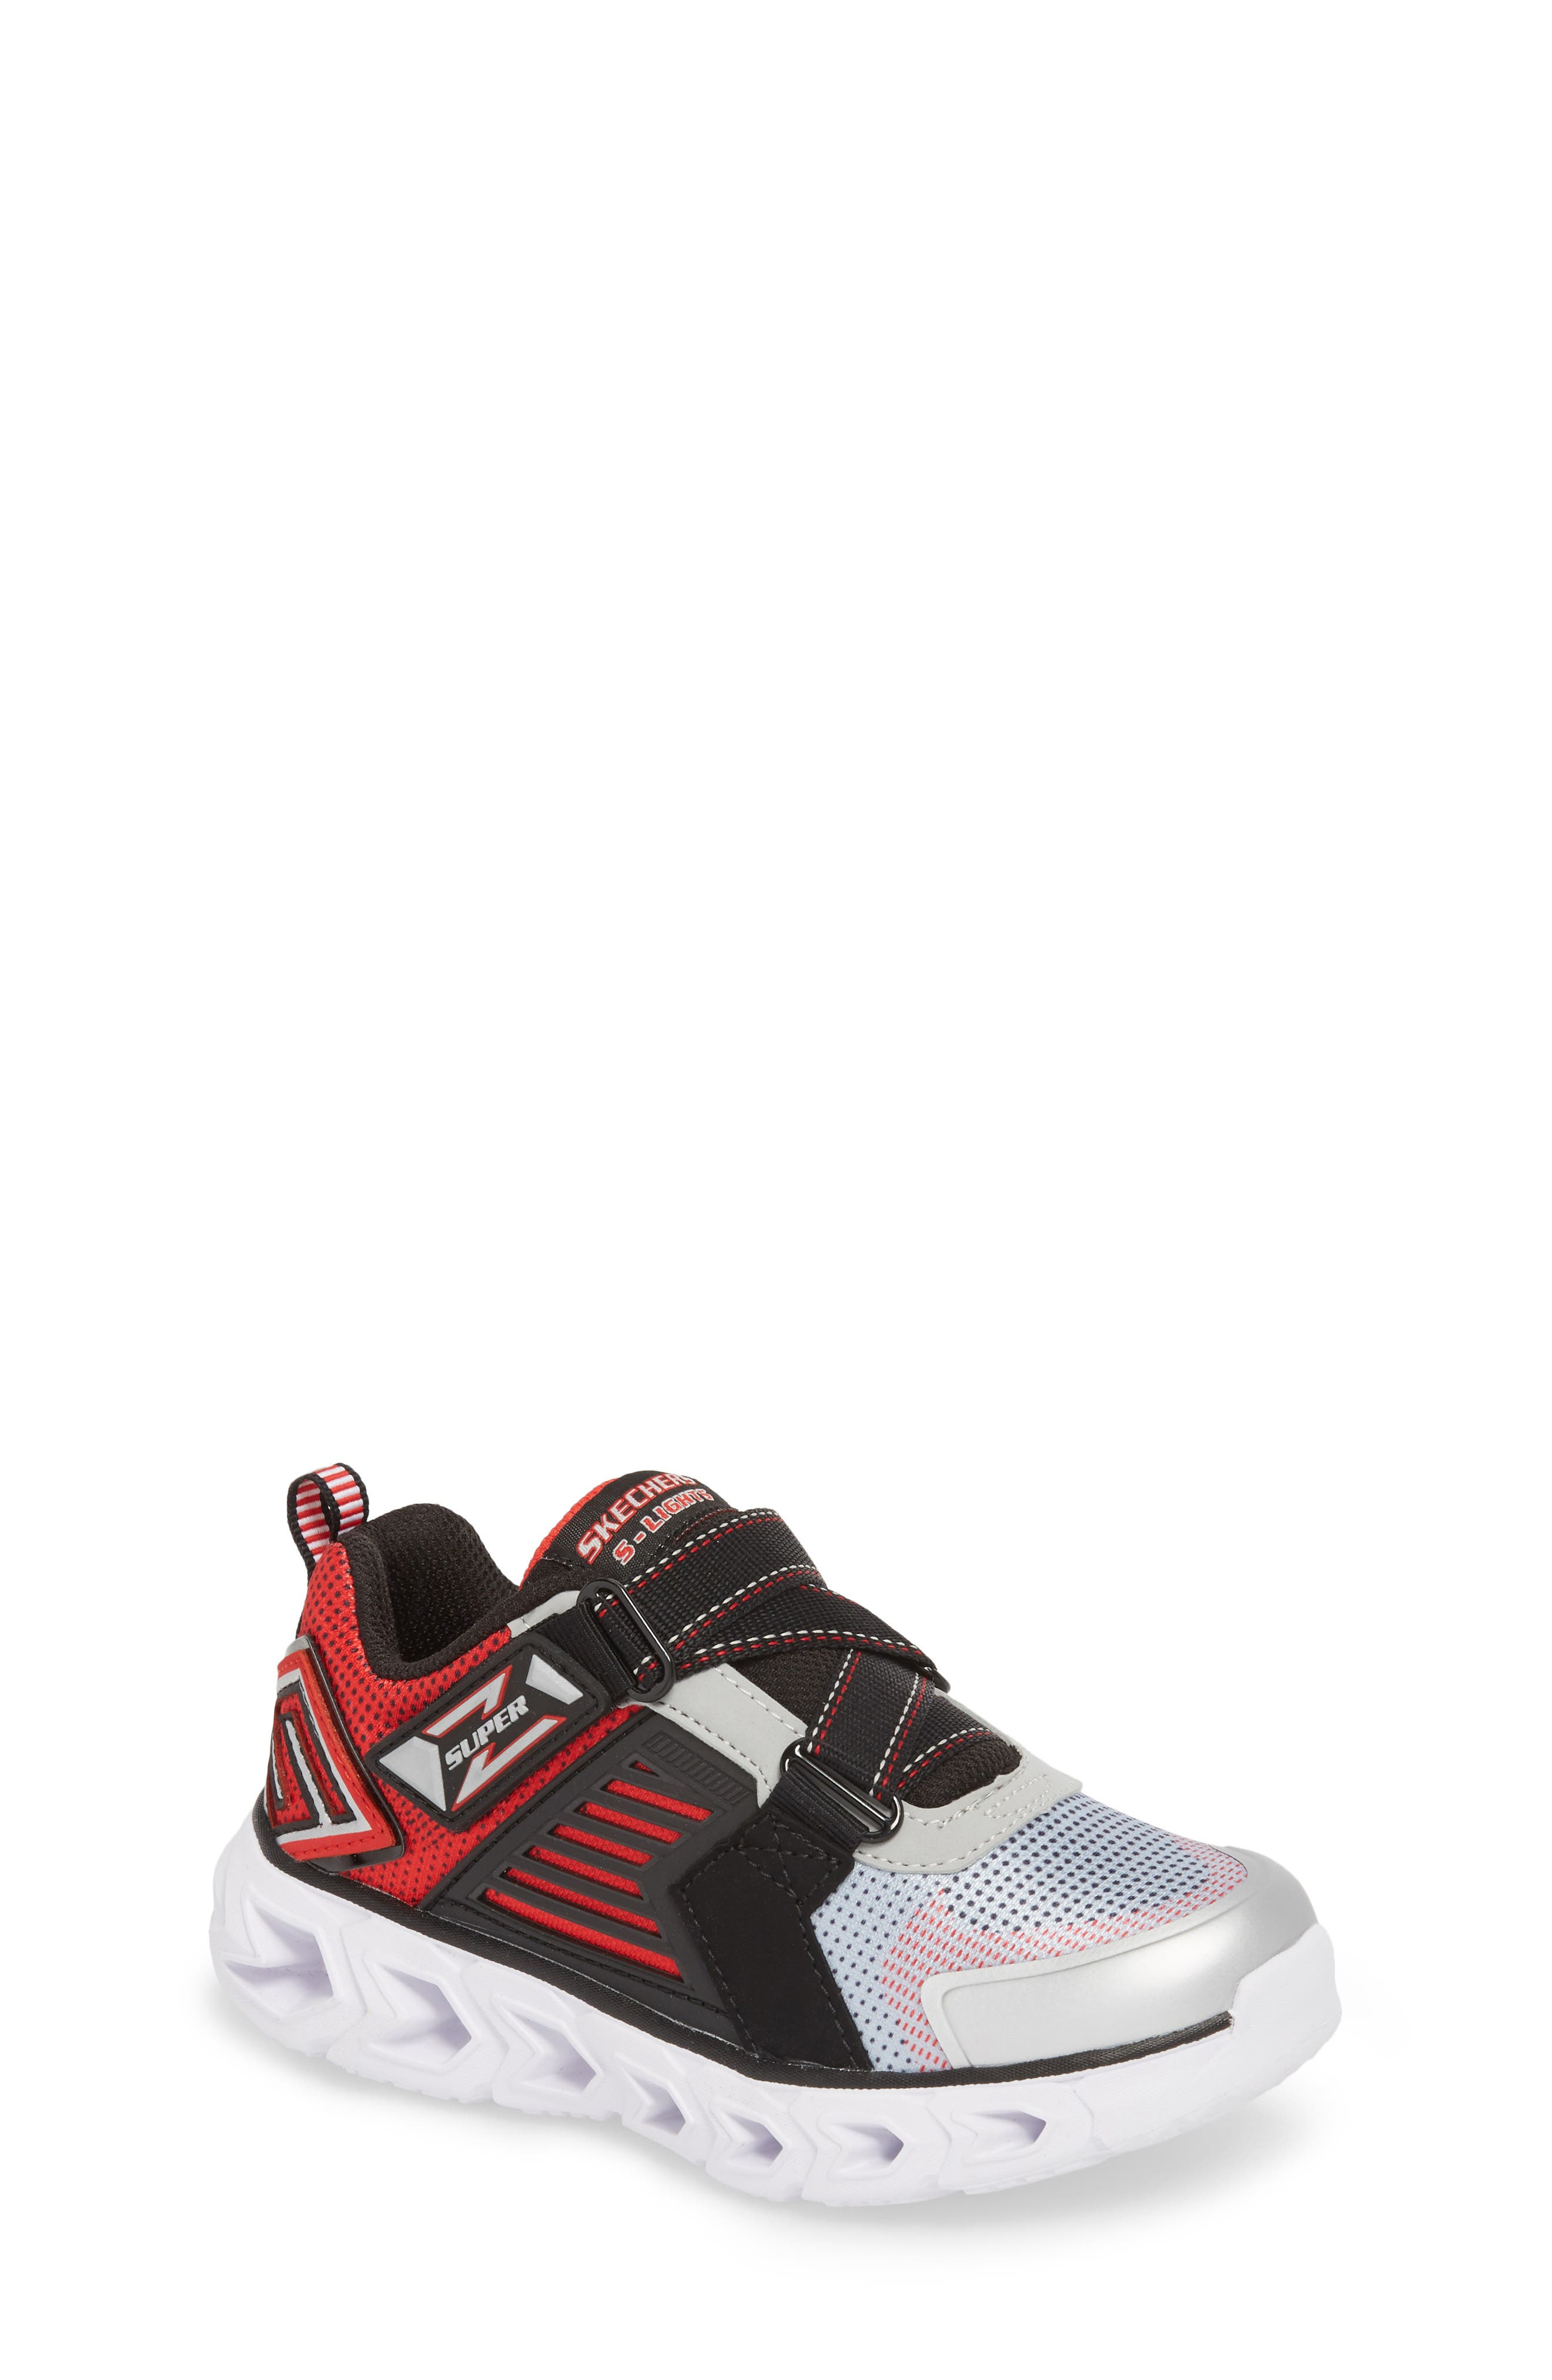 Hypno-Flash 2.0 Rapid Quake Sneakers,                         Main,                         color,